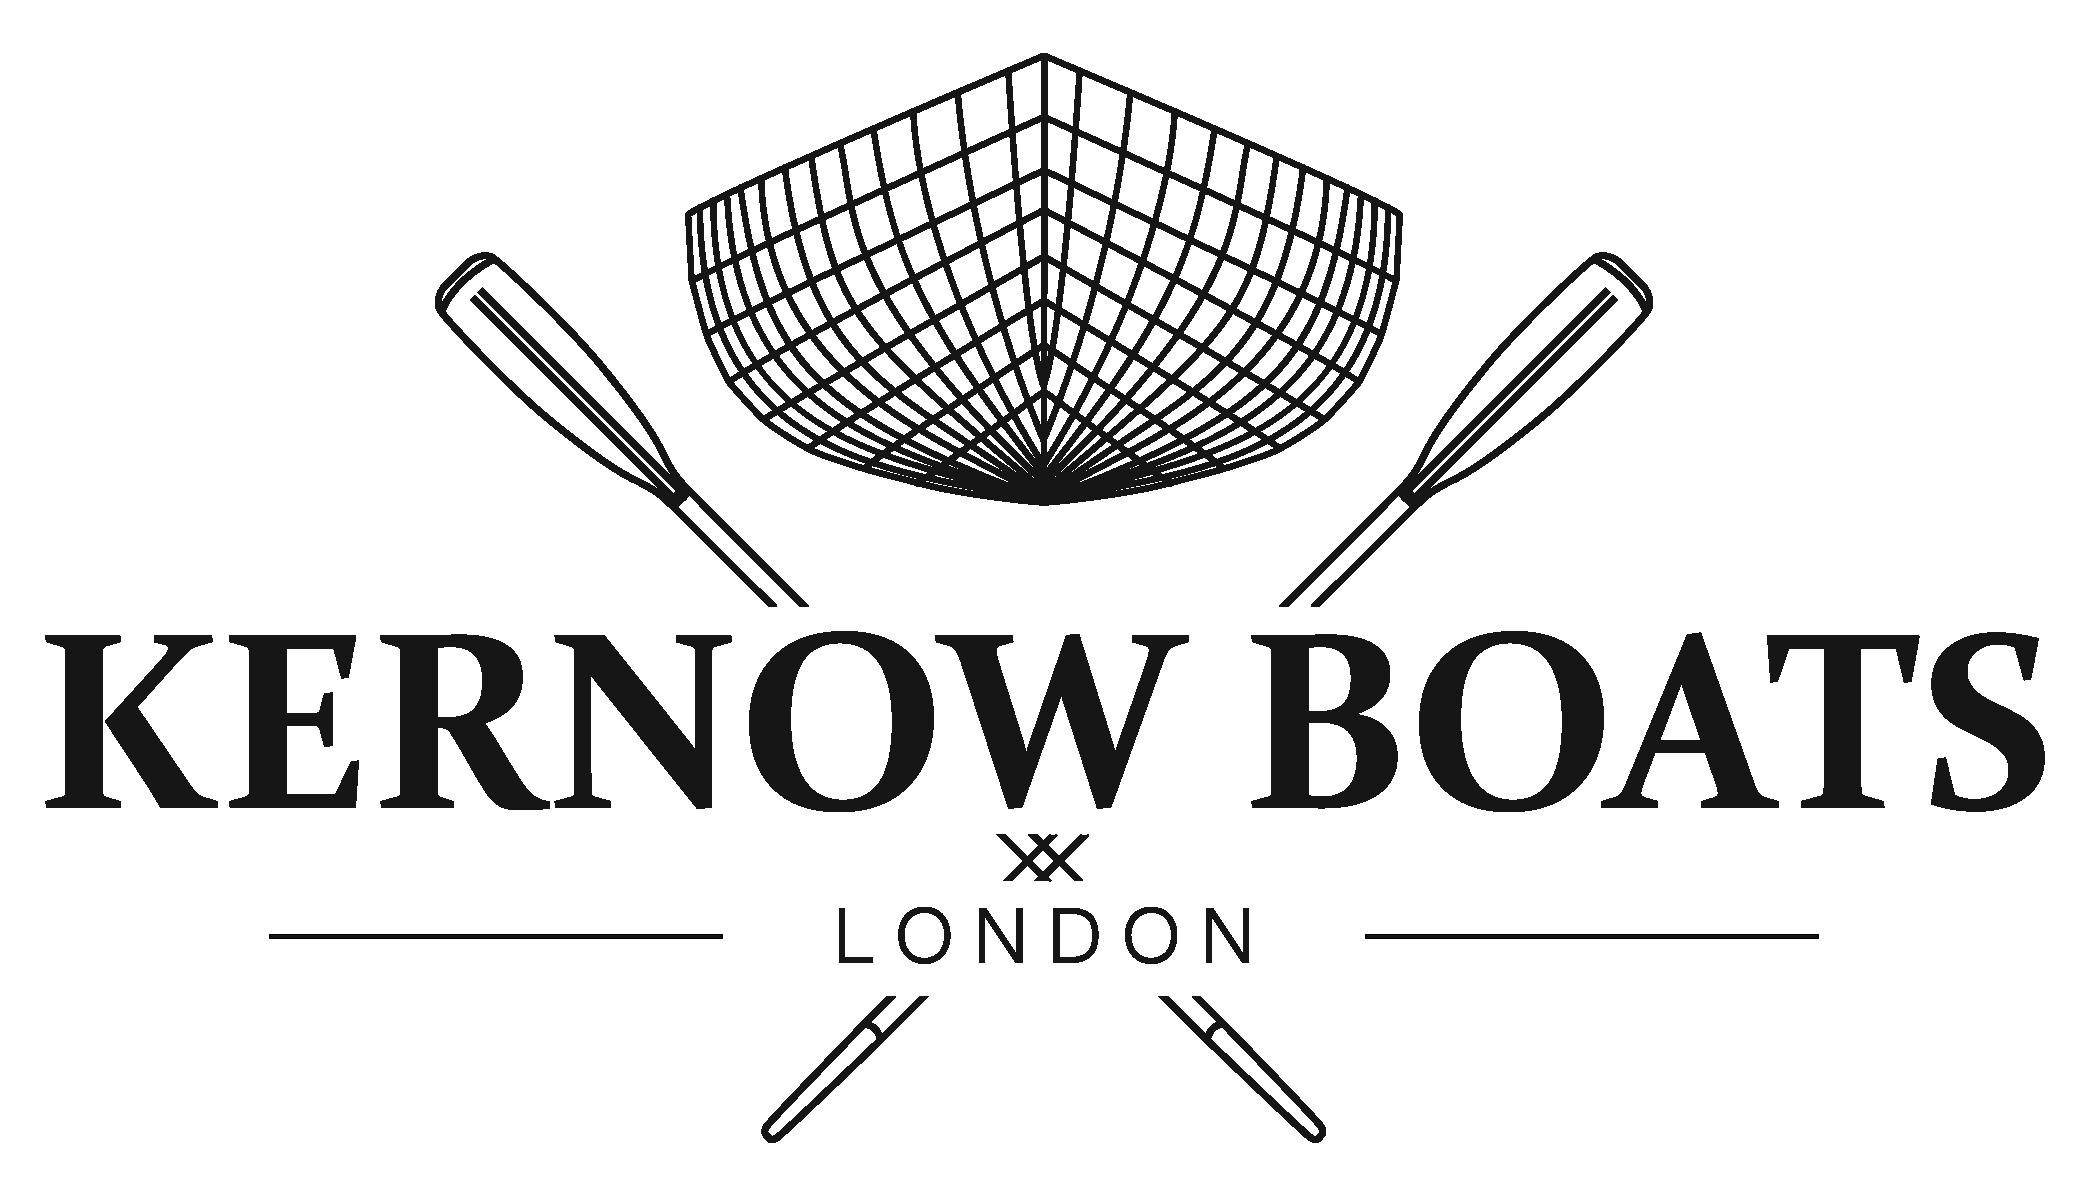 Kernow Boats